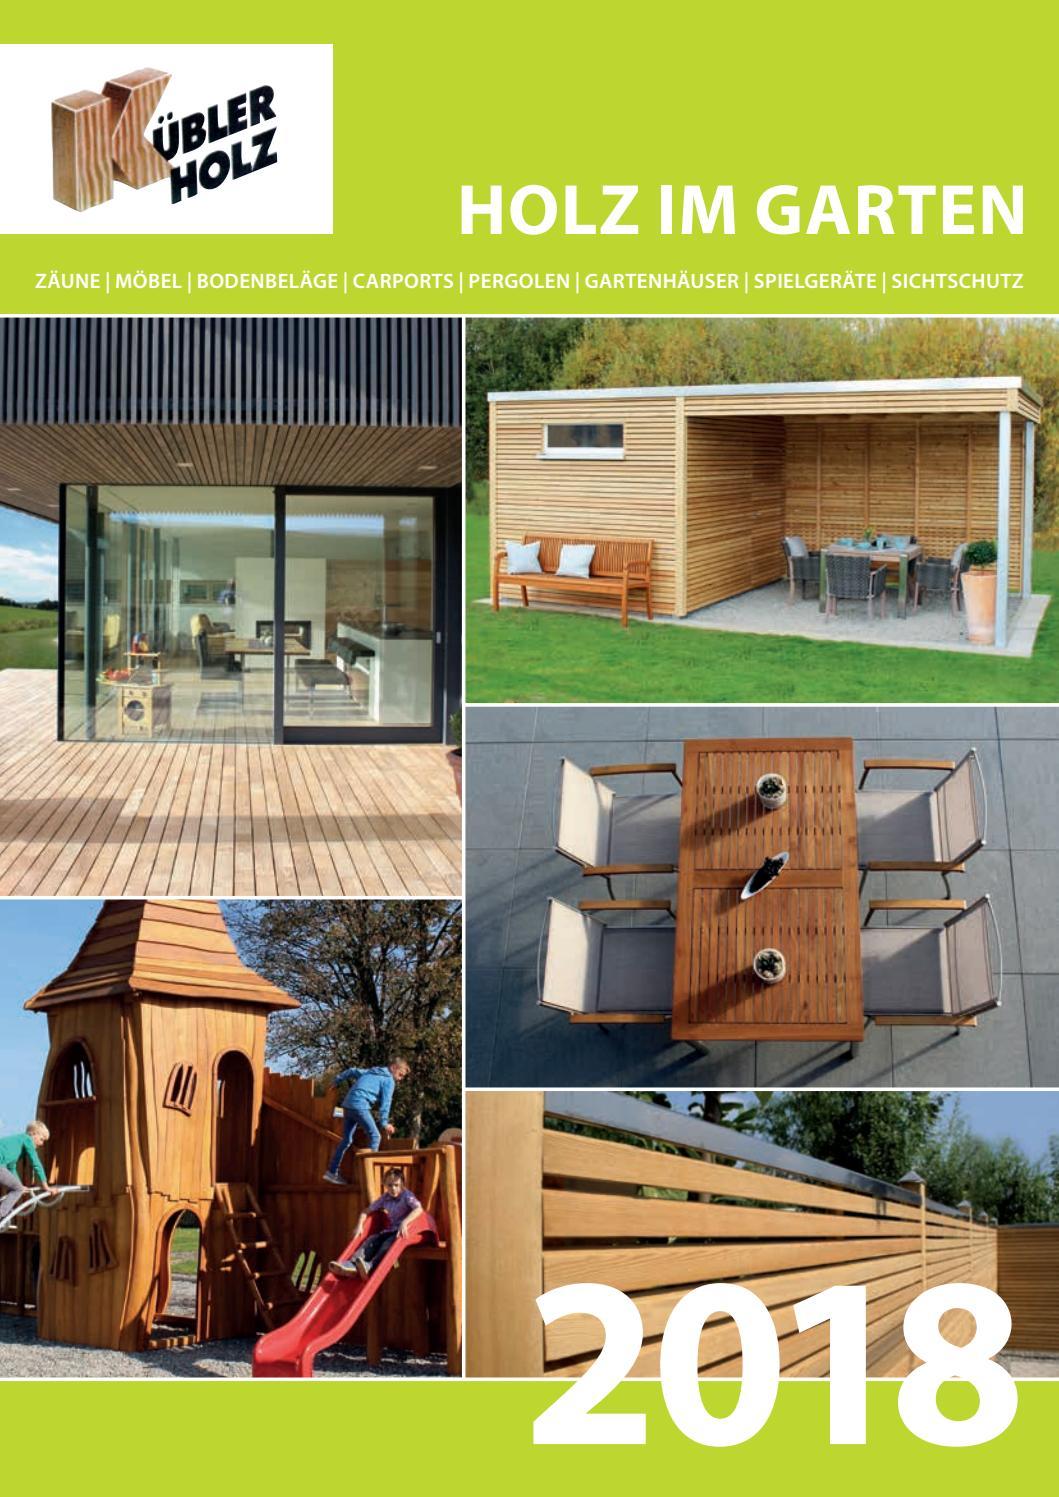 Holz Kubler Gartenmobel By Kaiser Design Issuu